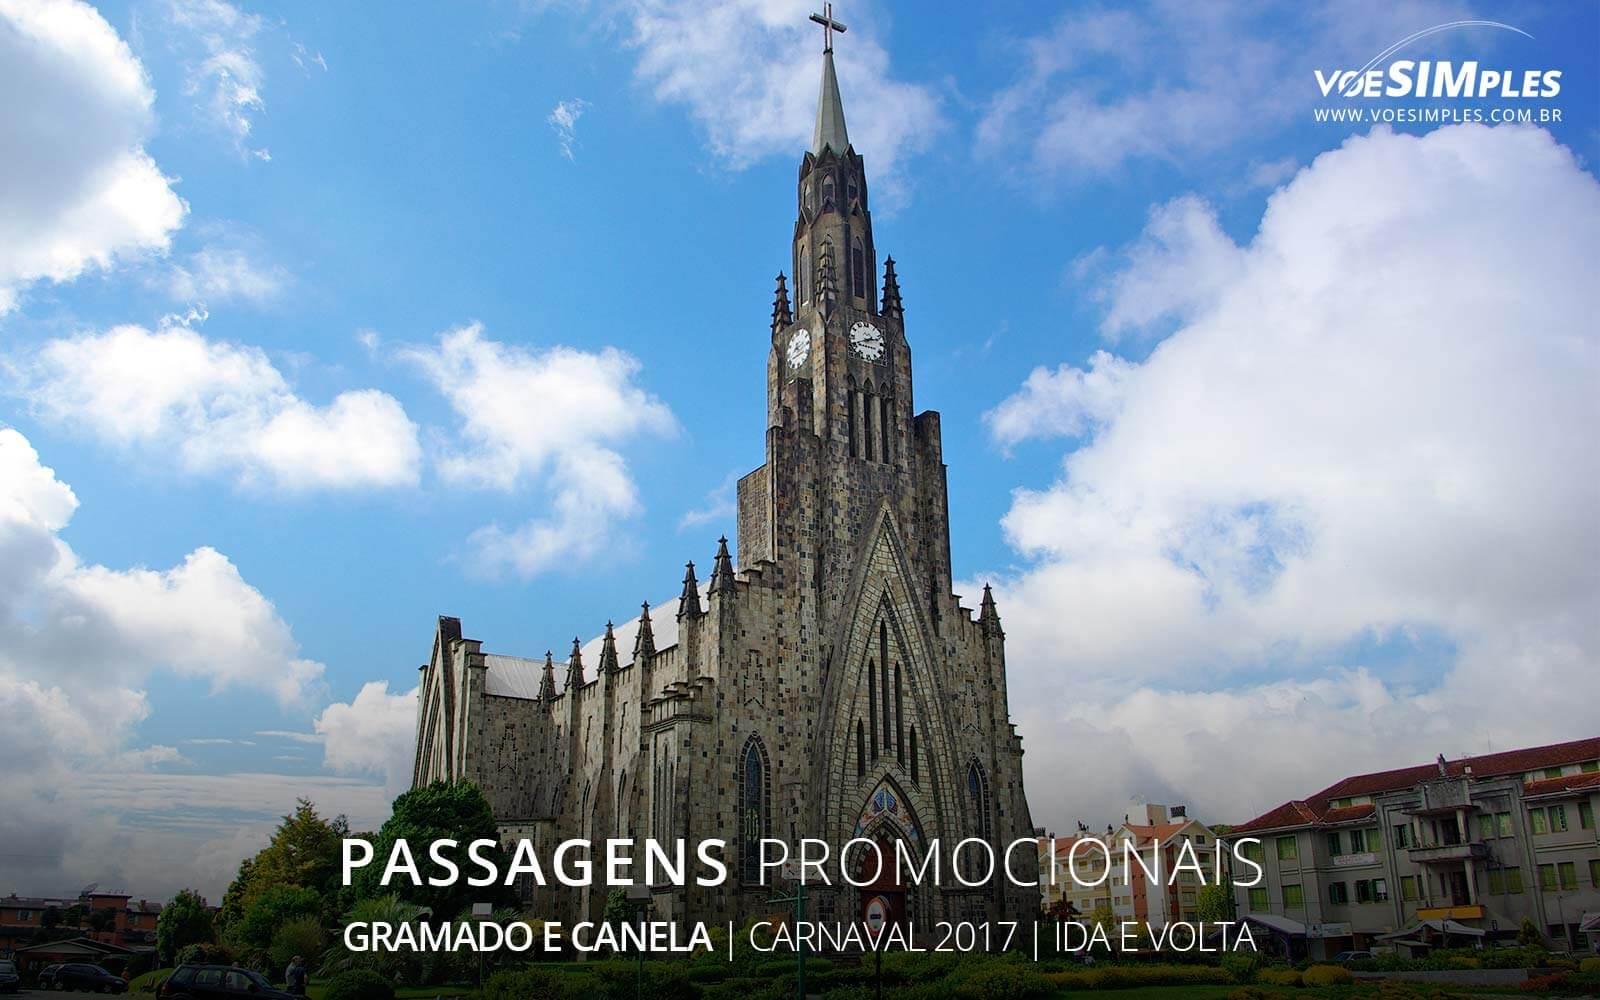 passagens-aereas-baratas-carnaval-voe-simples-passages-aereas-promocionais-carnaval-passagens-promo-carnaval-8